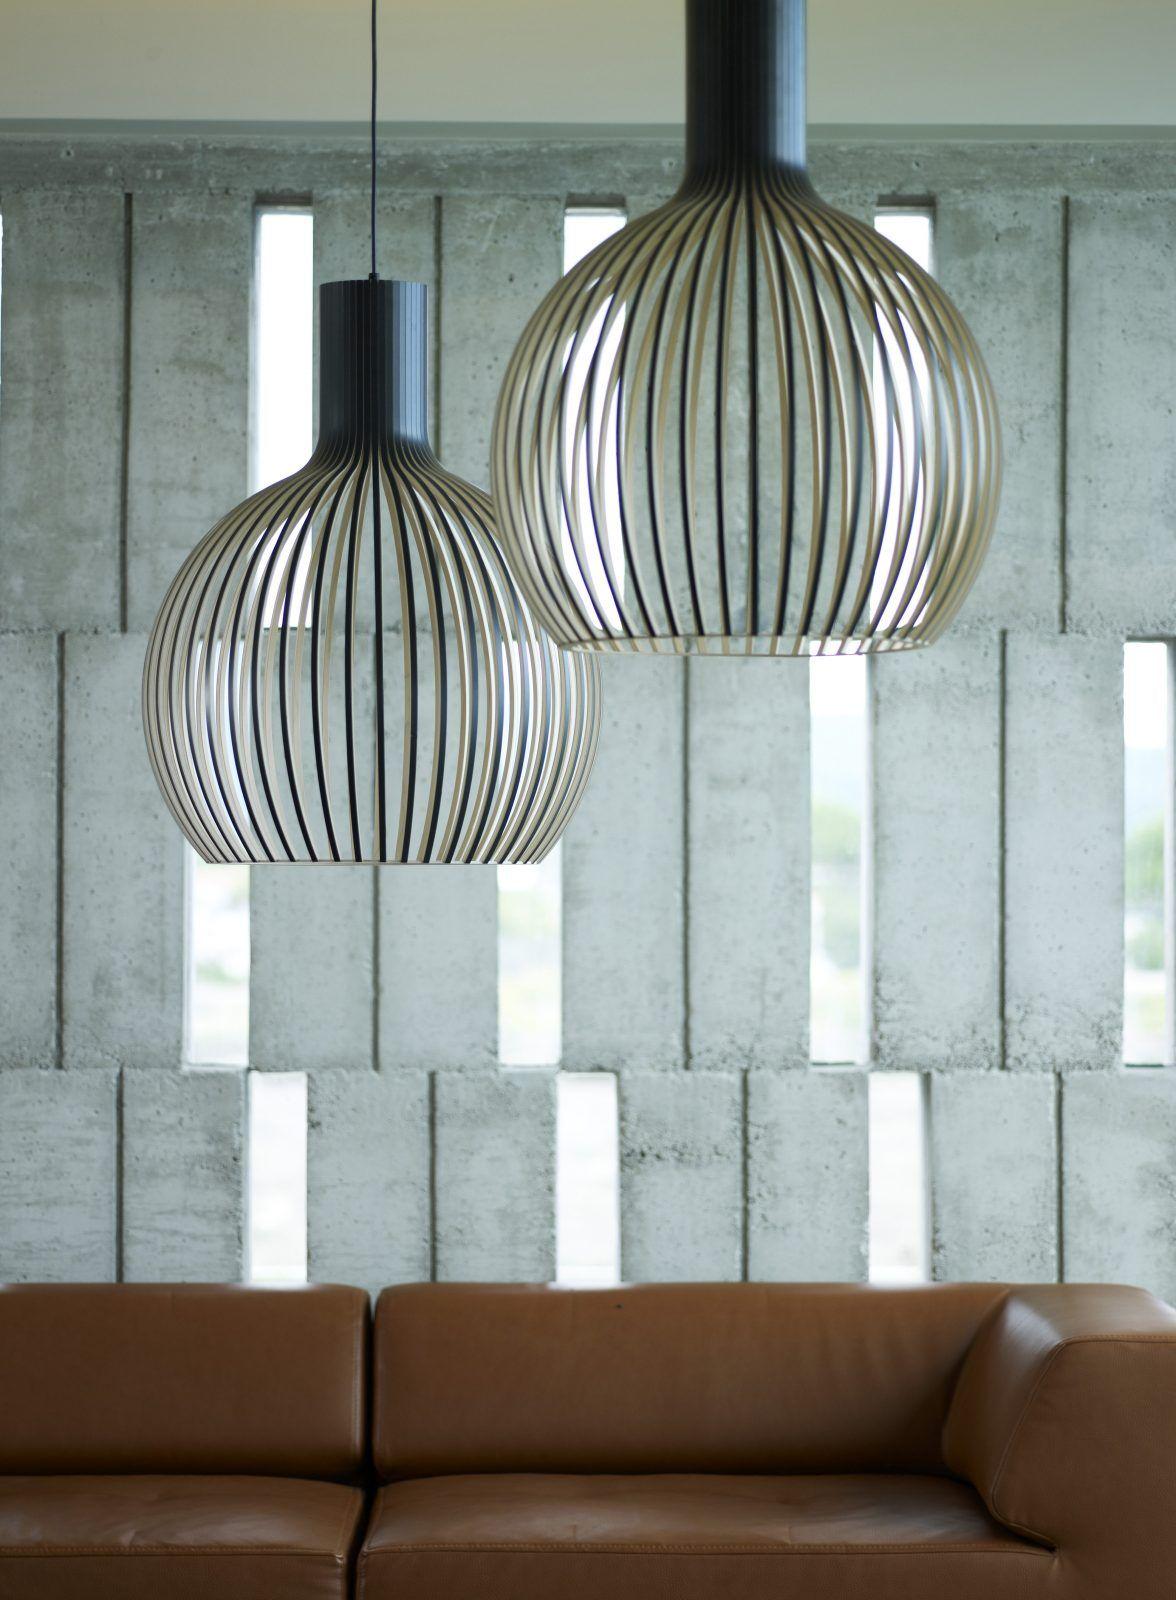 Secto Design Octo 4240 Pendelleuchte | Lamp design, Wooden